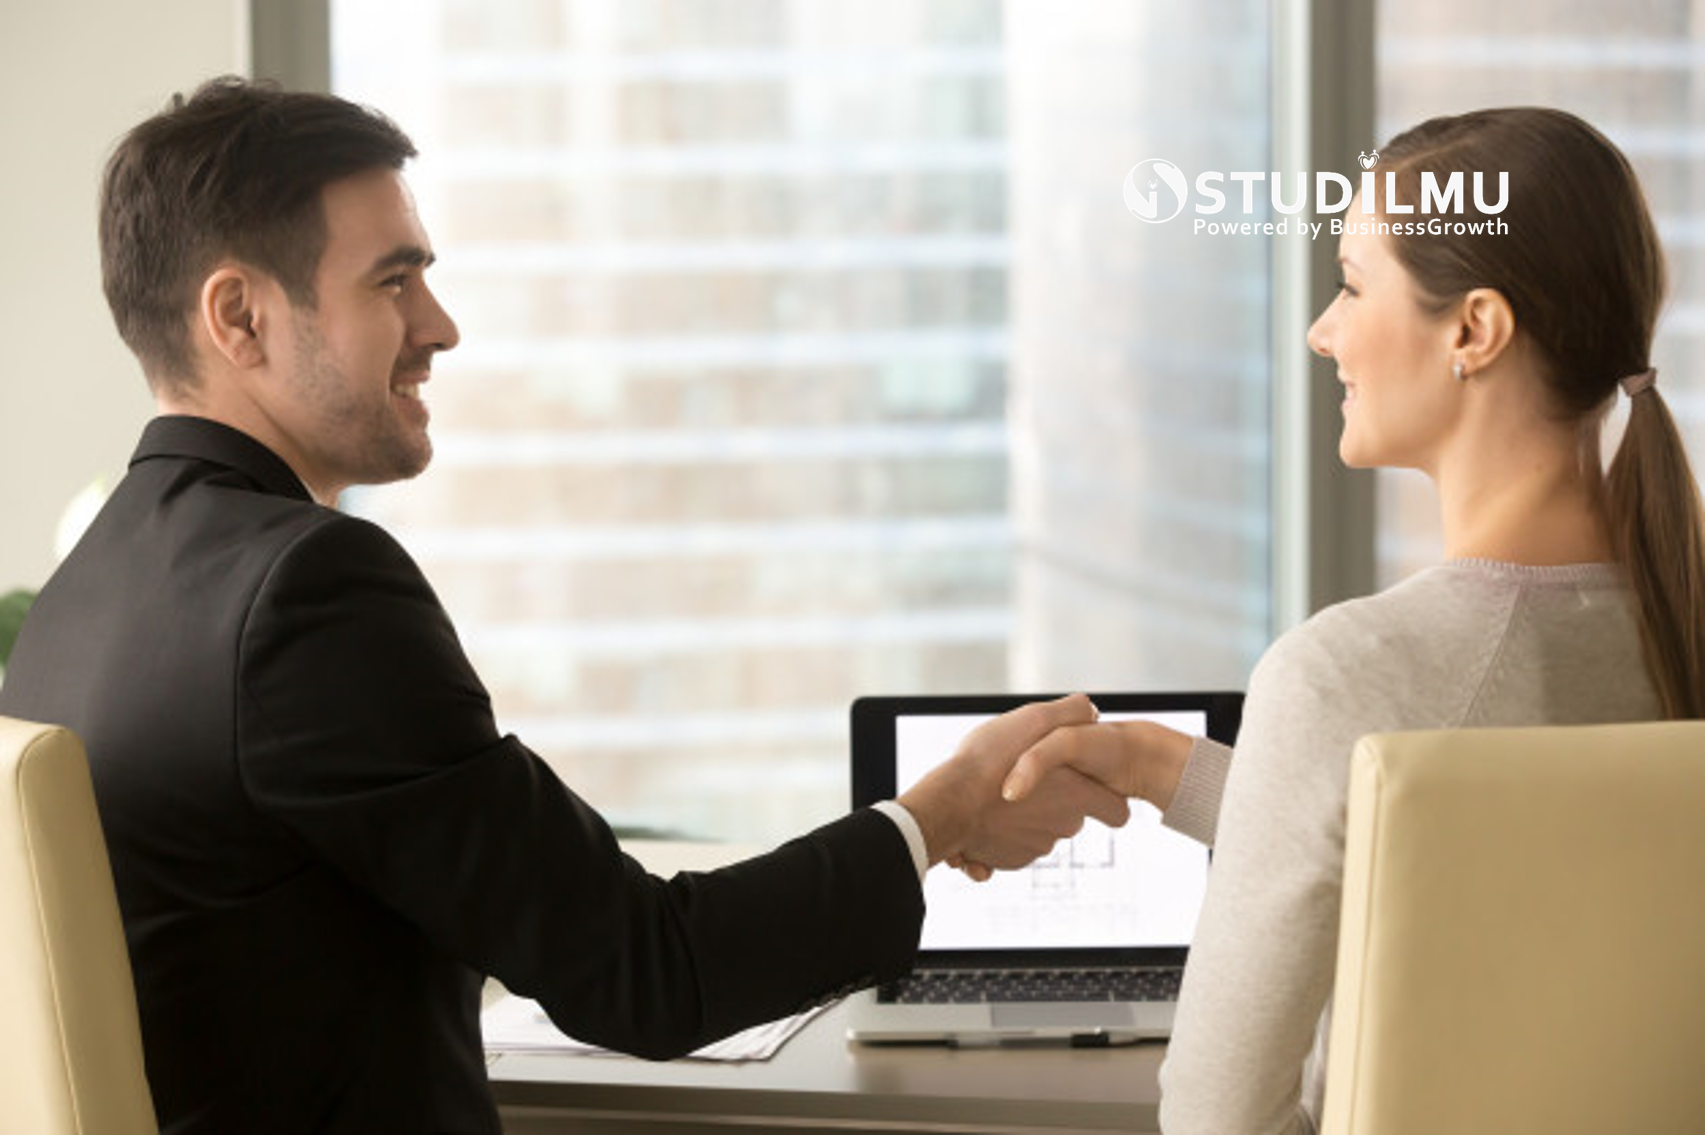 STUDILMU Career Advice - 10 Taktik Negosiasi seperti Seorang Pemimpin